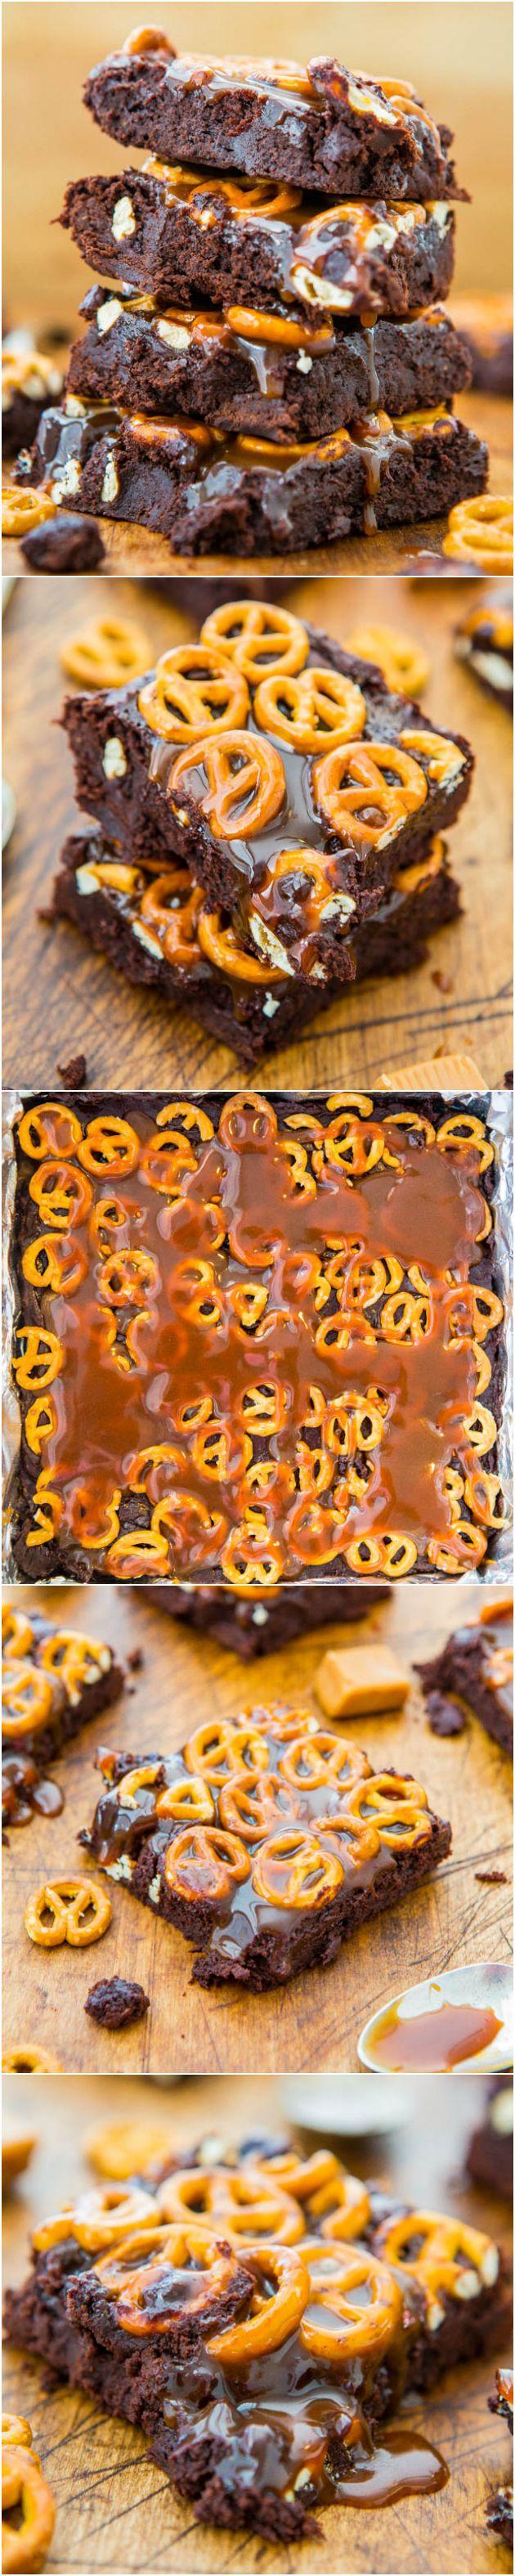 Caramel Pretzel Fudgy Brownies - Supremely fudgy scratch brownies ...